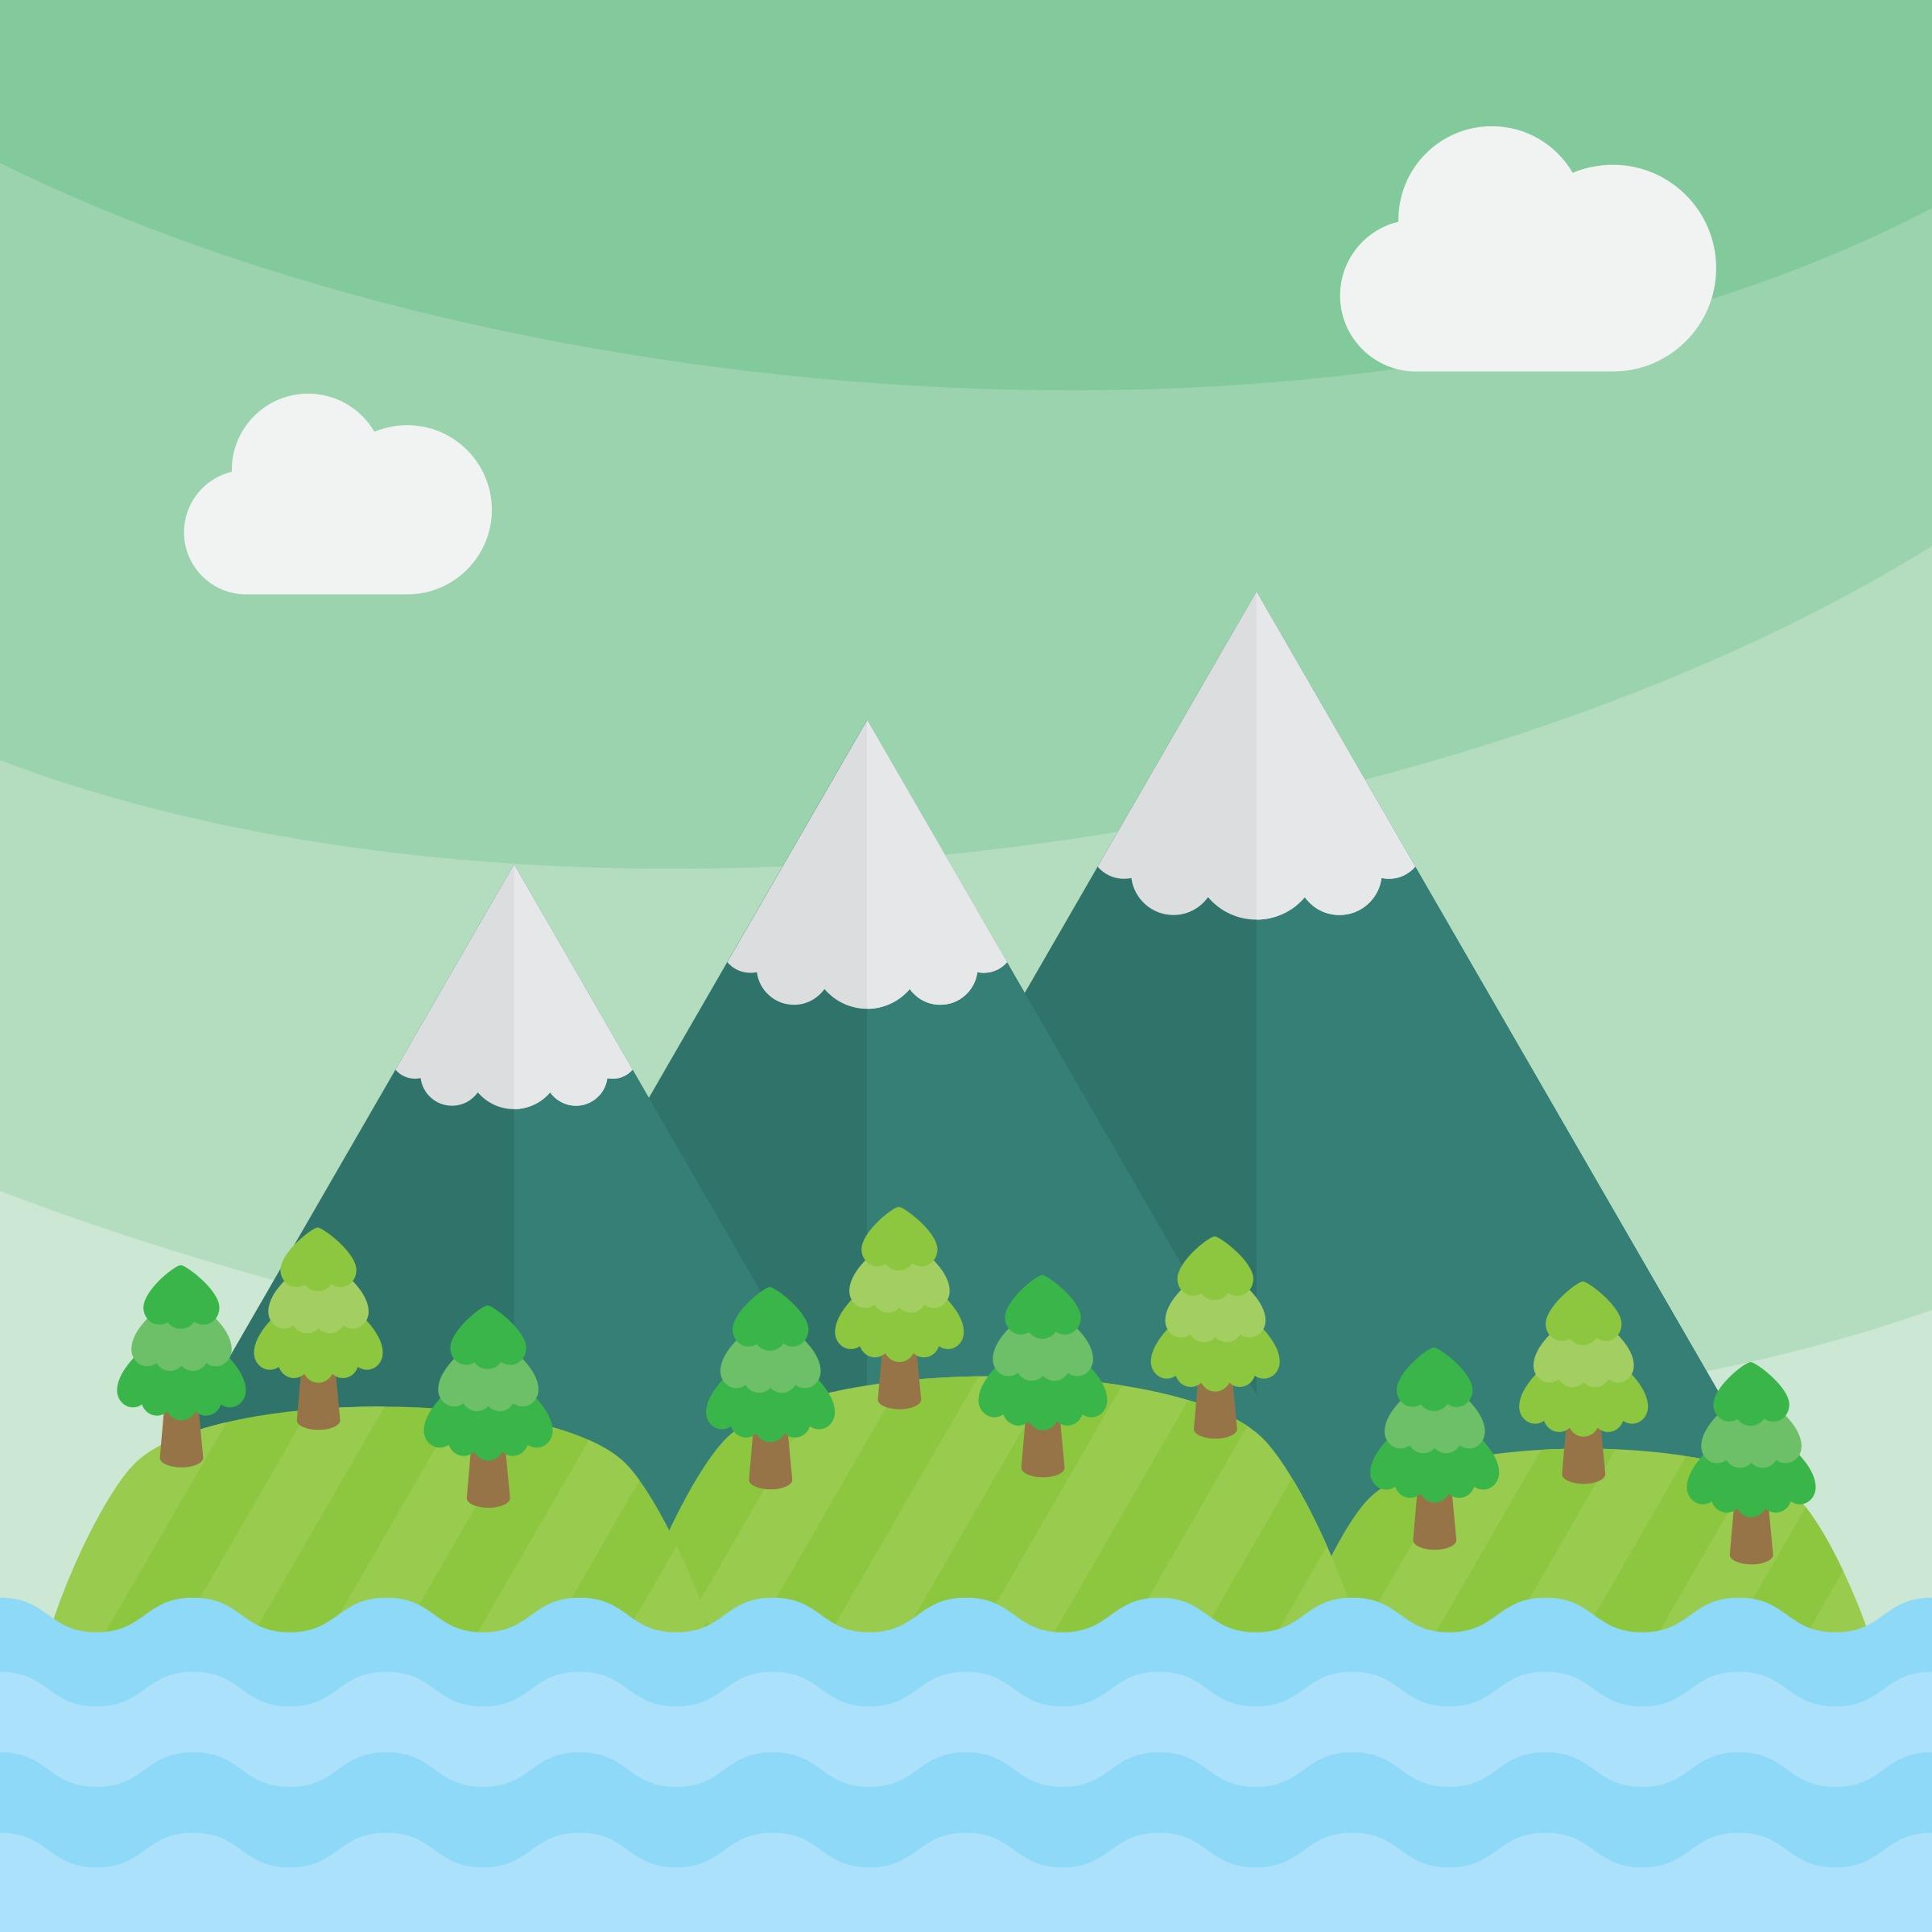 ... Vector Landscape - Download Free Vector Art, Stock Graphics & Images